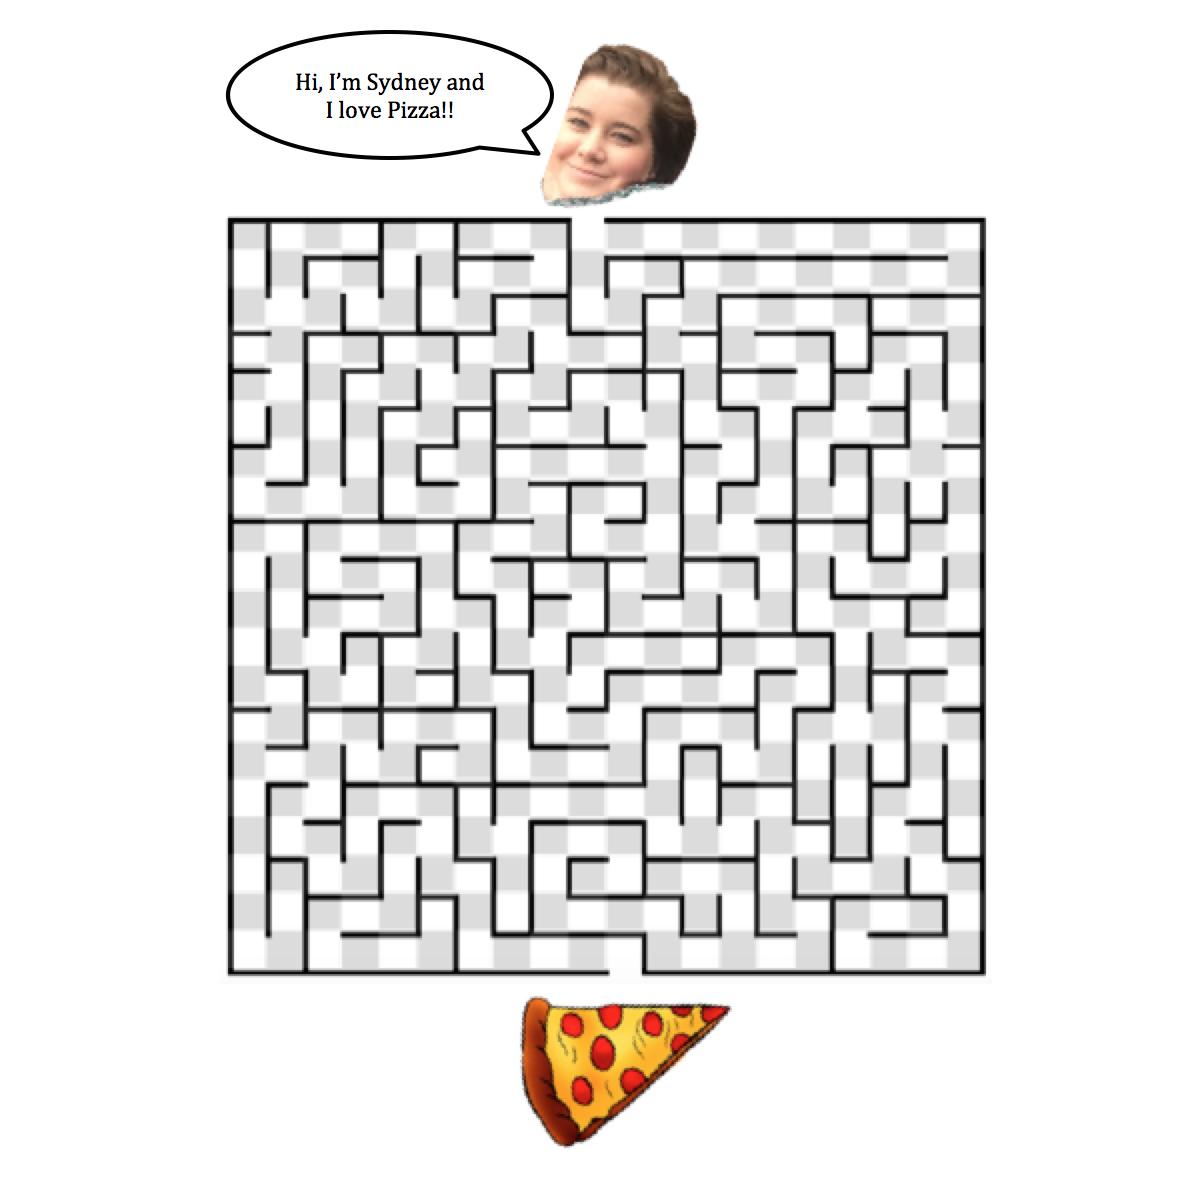 Drawn maze cereal Ds106 Make a Maze A